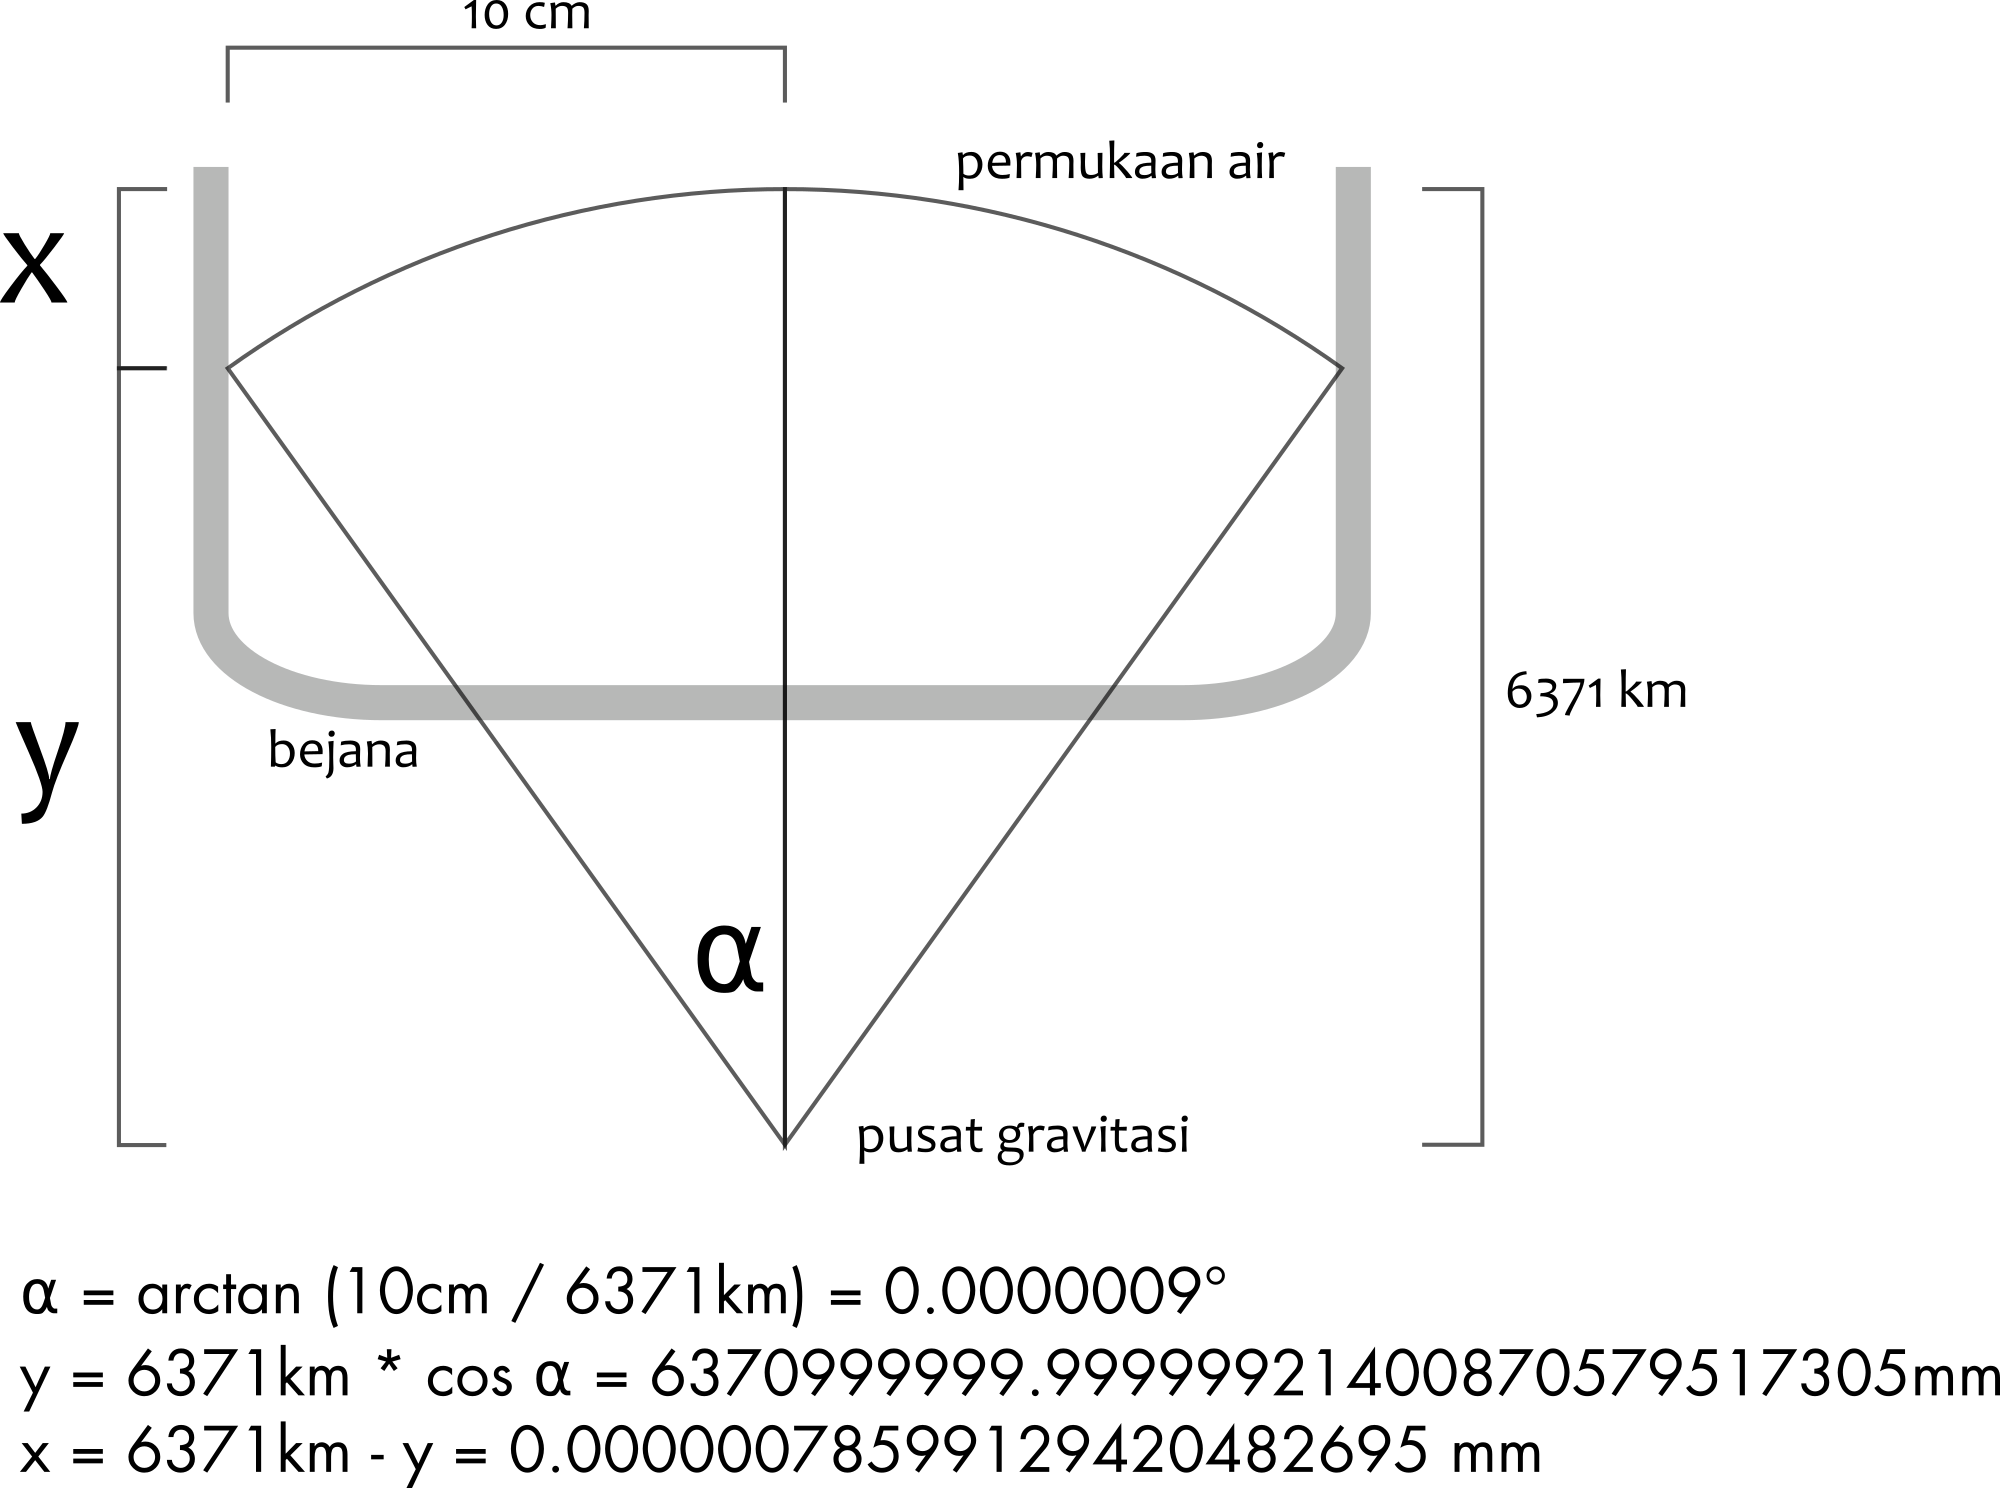 Perhitungan kelengkungan permukaan airg ccuart Gallery